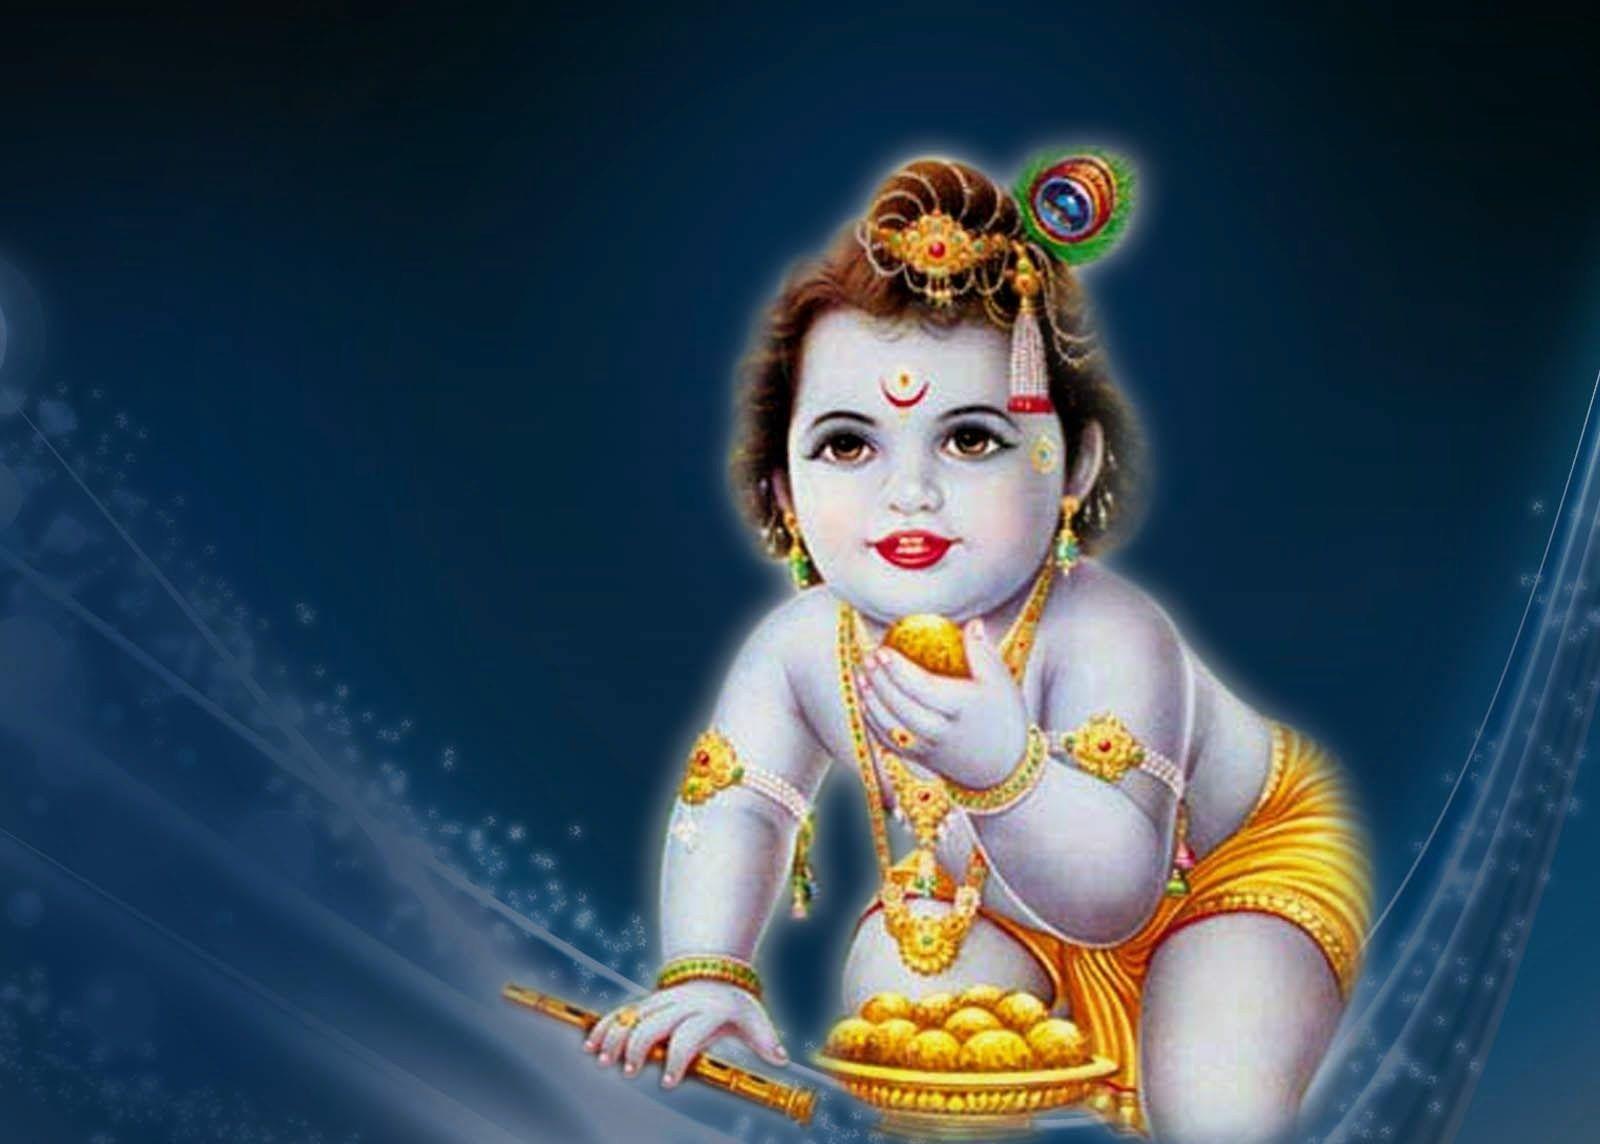 Loves krishna nice hd wallpapers krishna hd wallpapers wallpaper - Super Cute Images Of Bal Gopal Krishna Everyone Will Love